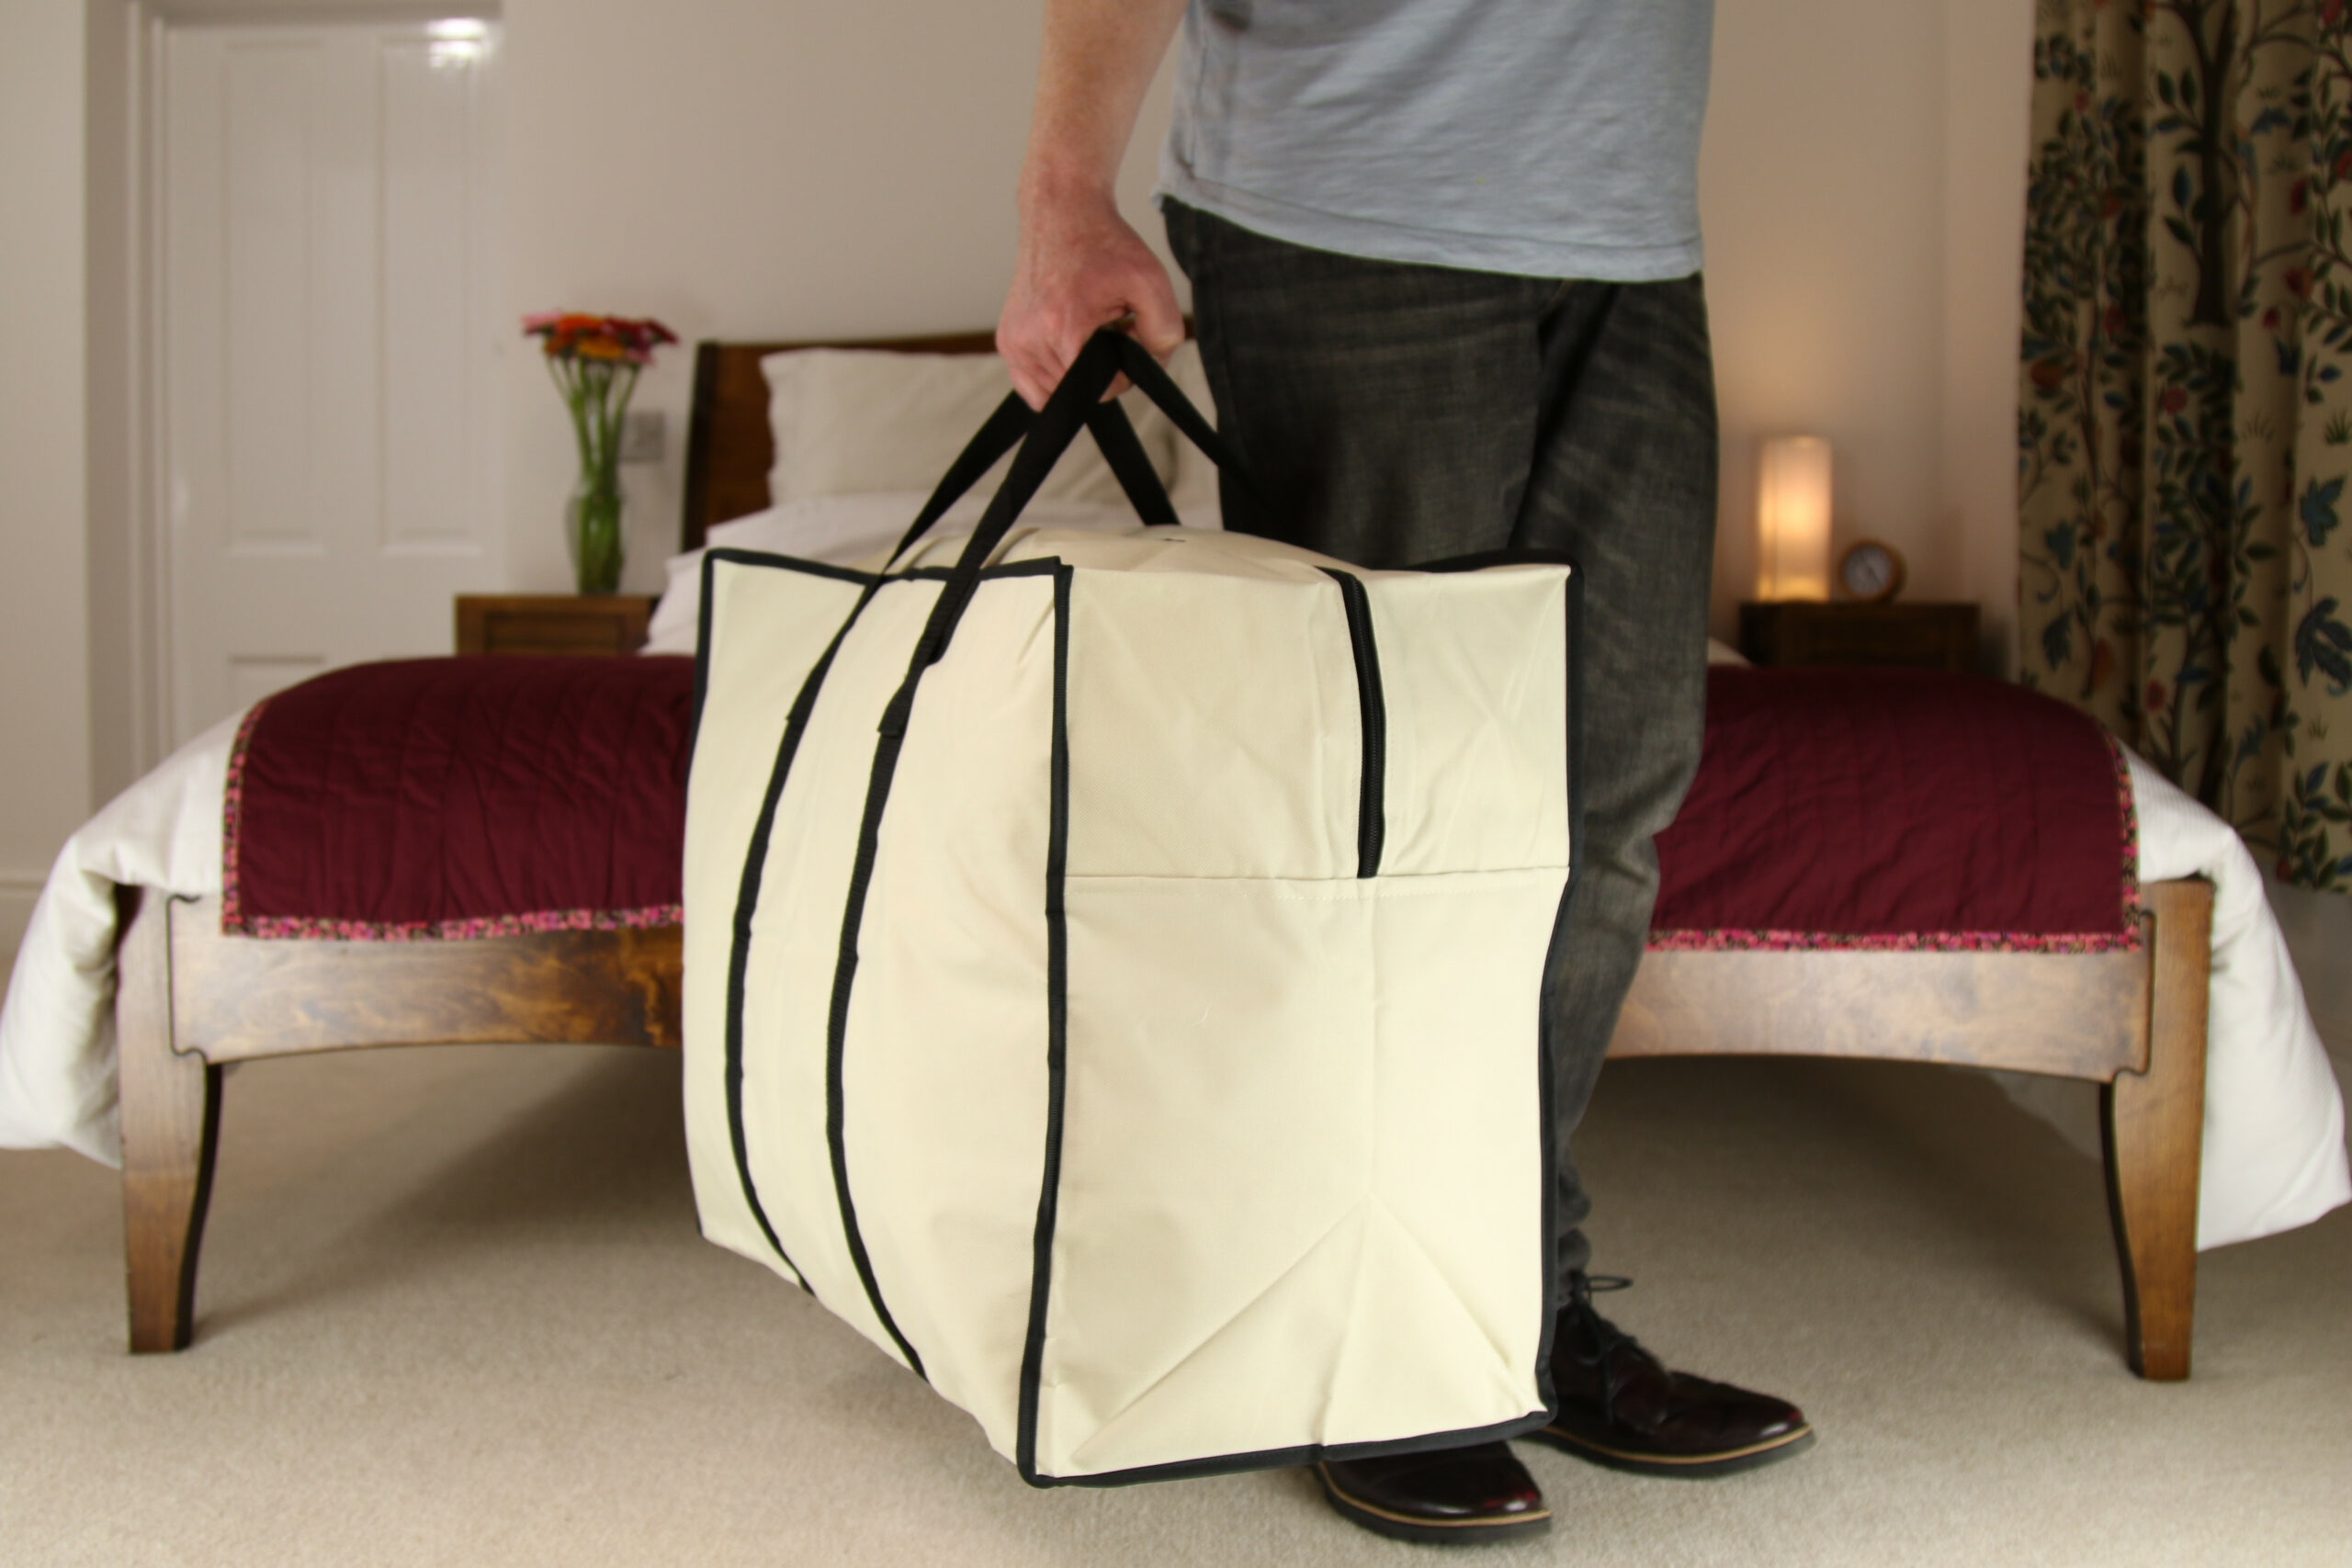 Medium Clothes Storage or Travel Bag, Heavy Duty, 70 Litre Capacity,  55x45x30cm, Beige